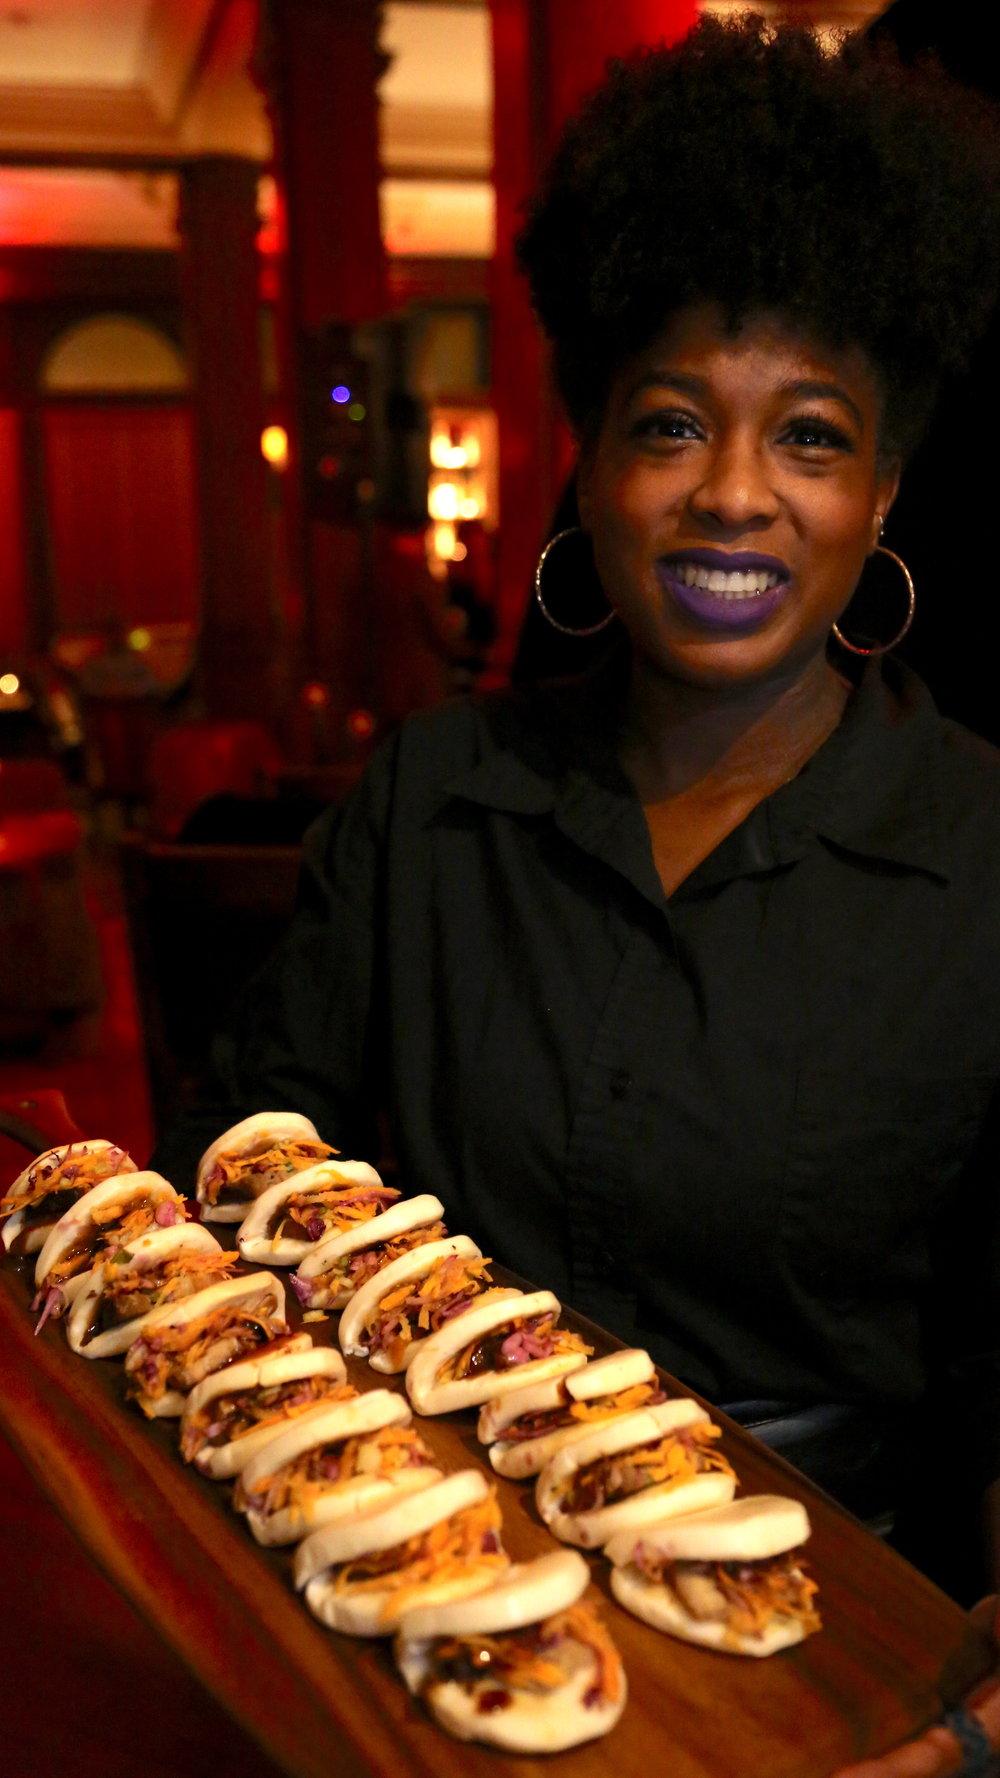 pork buns and server.JPG